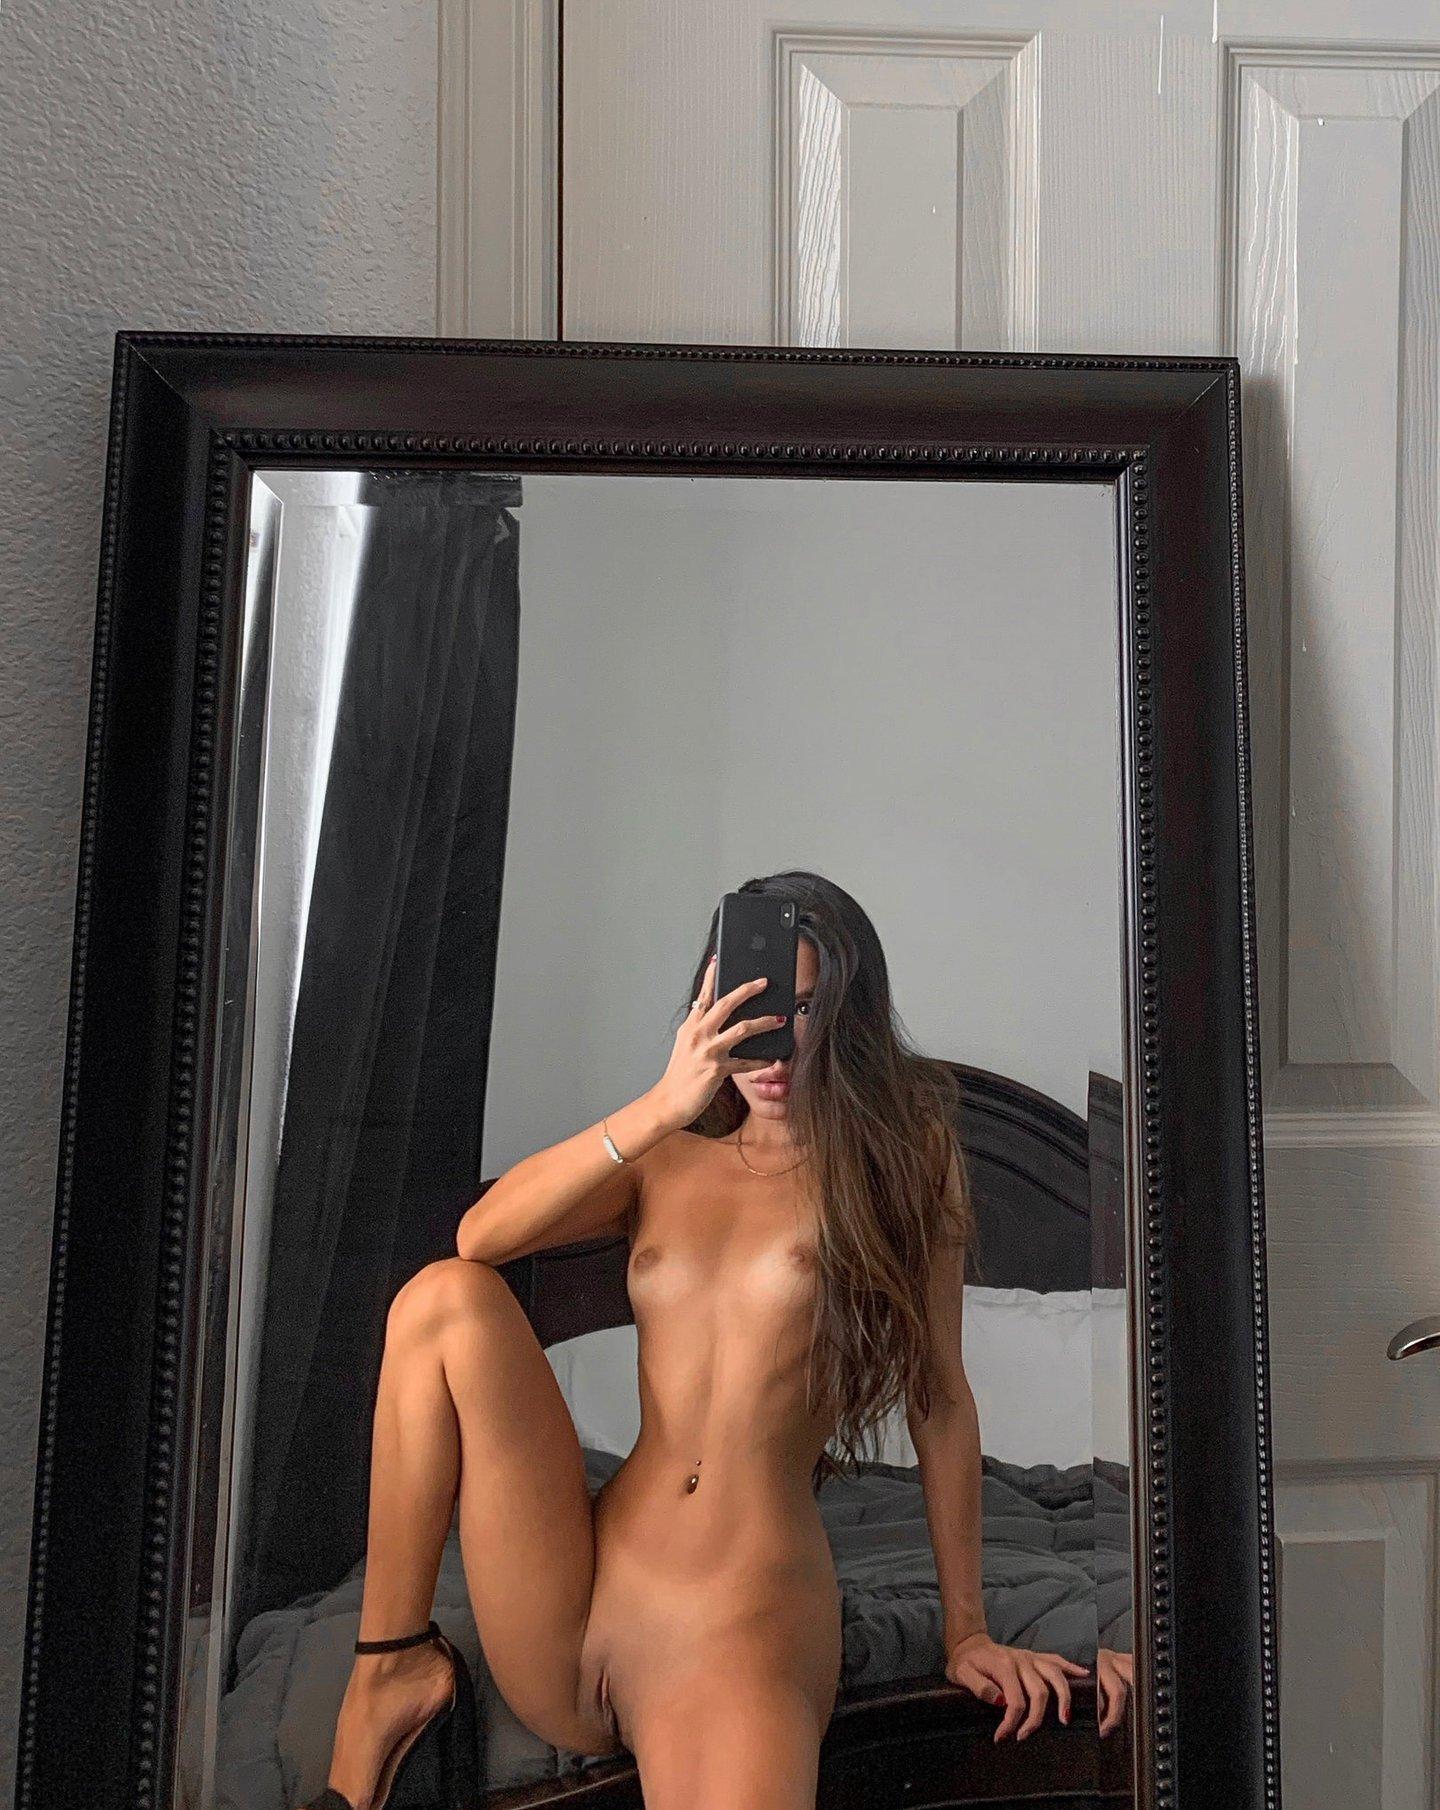 Goddess Angelina Angelina Onlyfans Nude Leaks 0020